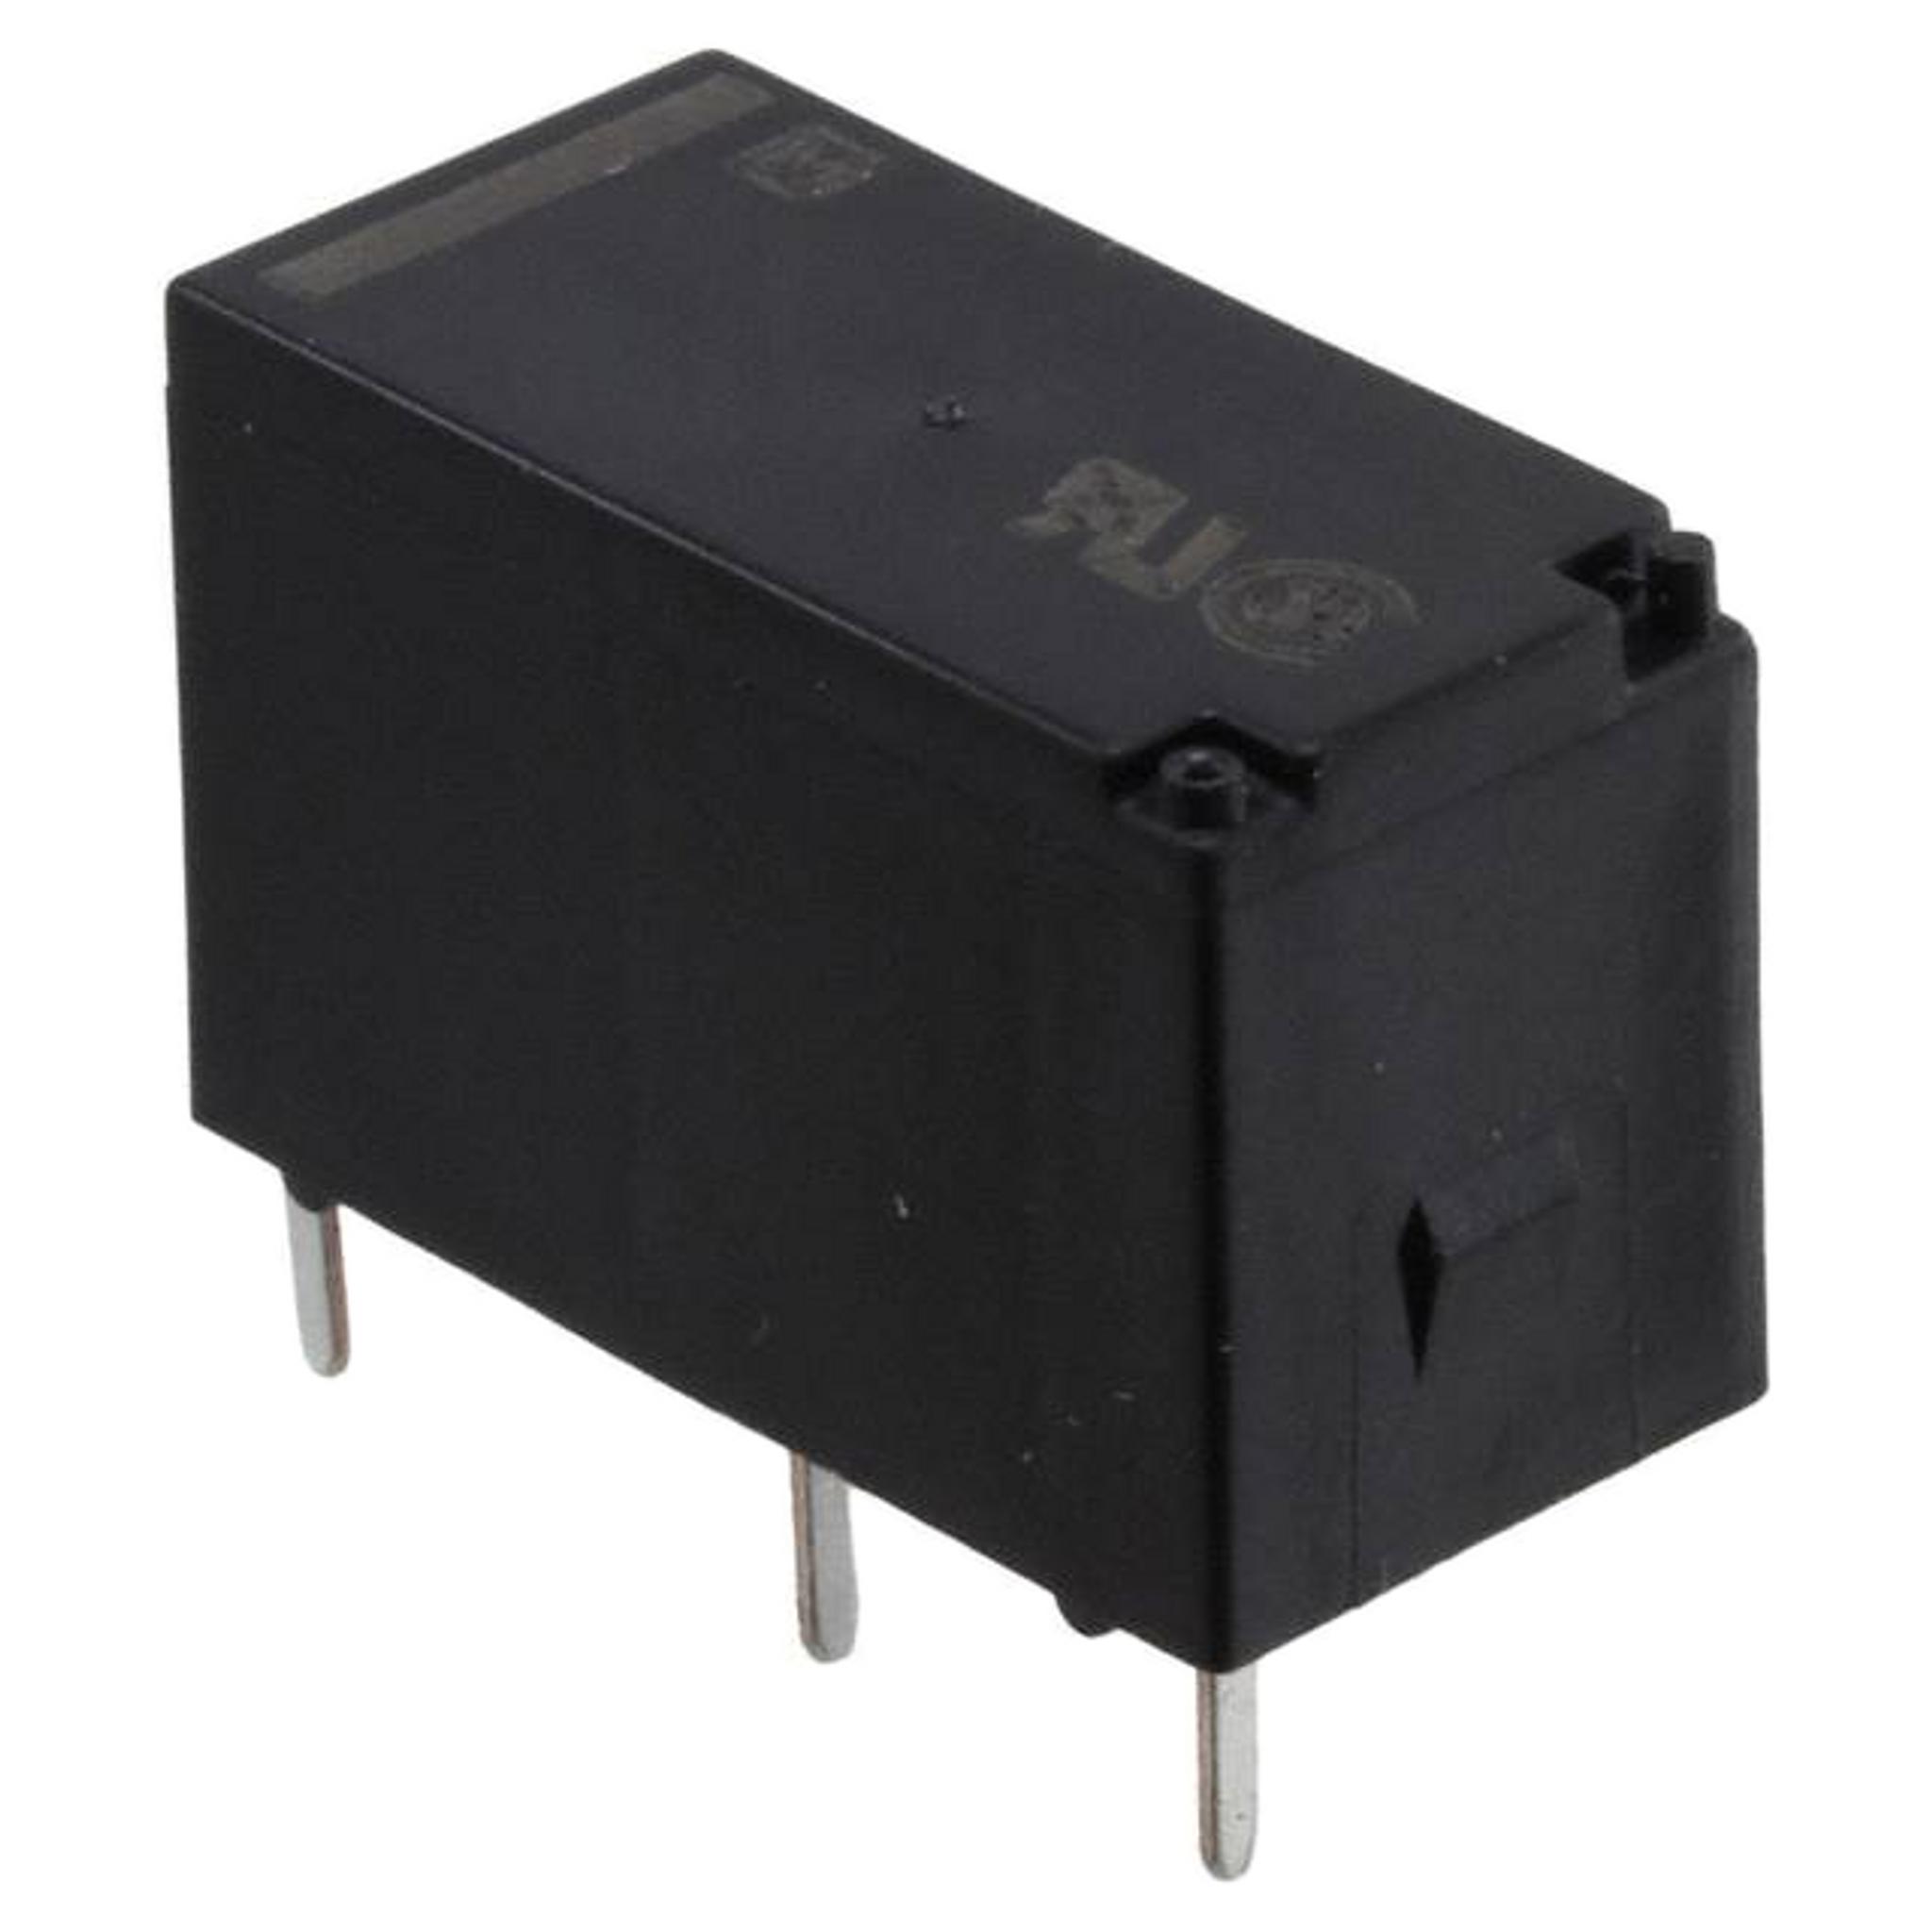 AQ2A2-C1-T5VDC  Solid State Relays AQ80239 PCB Mount 2A 5VDC 75-250VAC NON-ZER